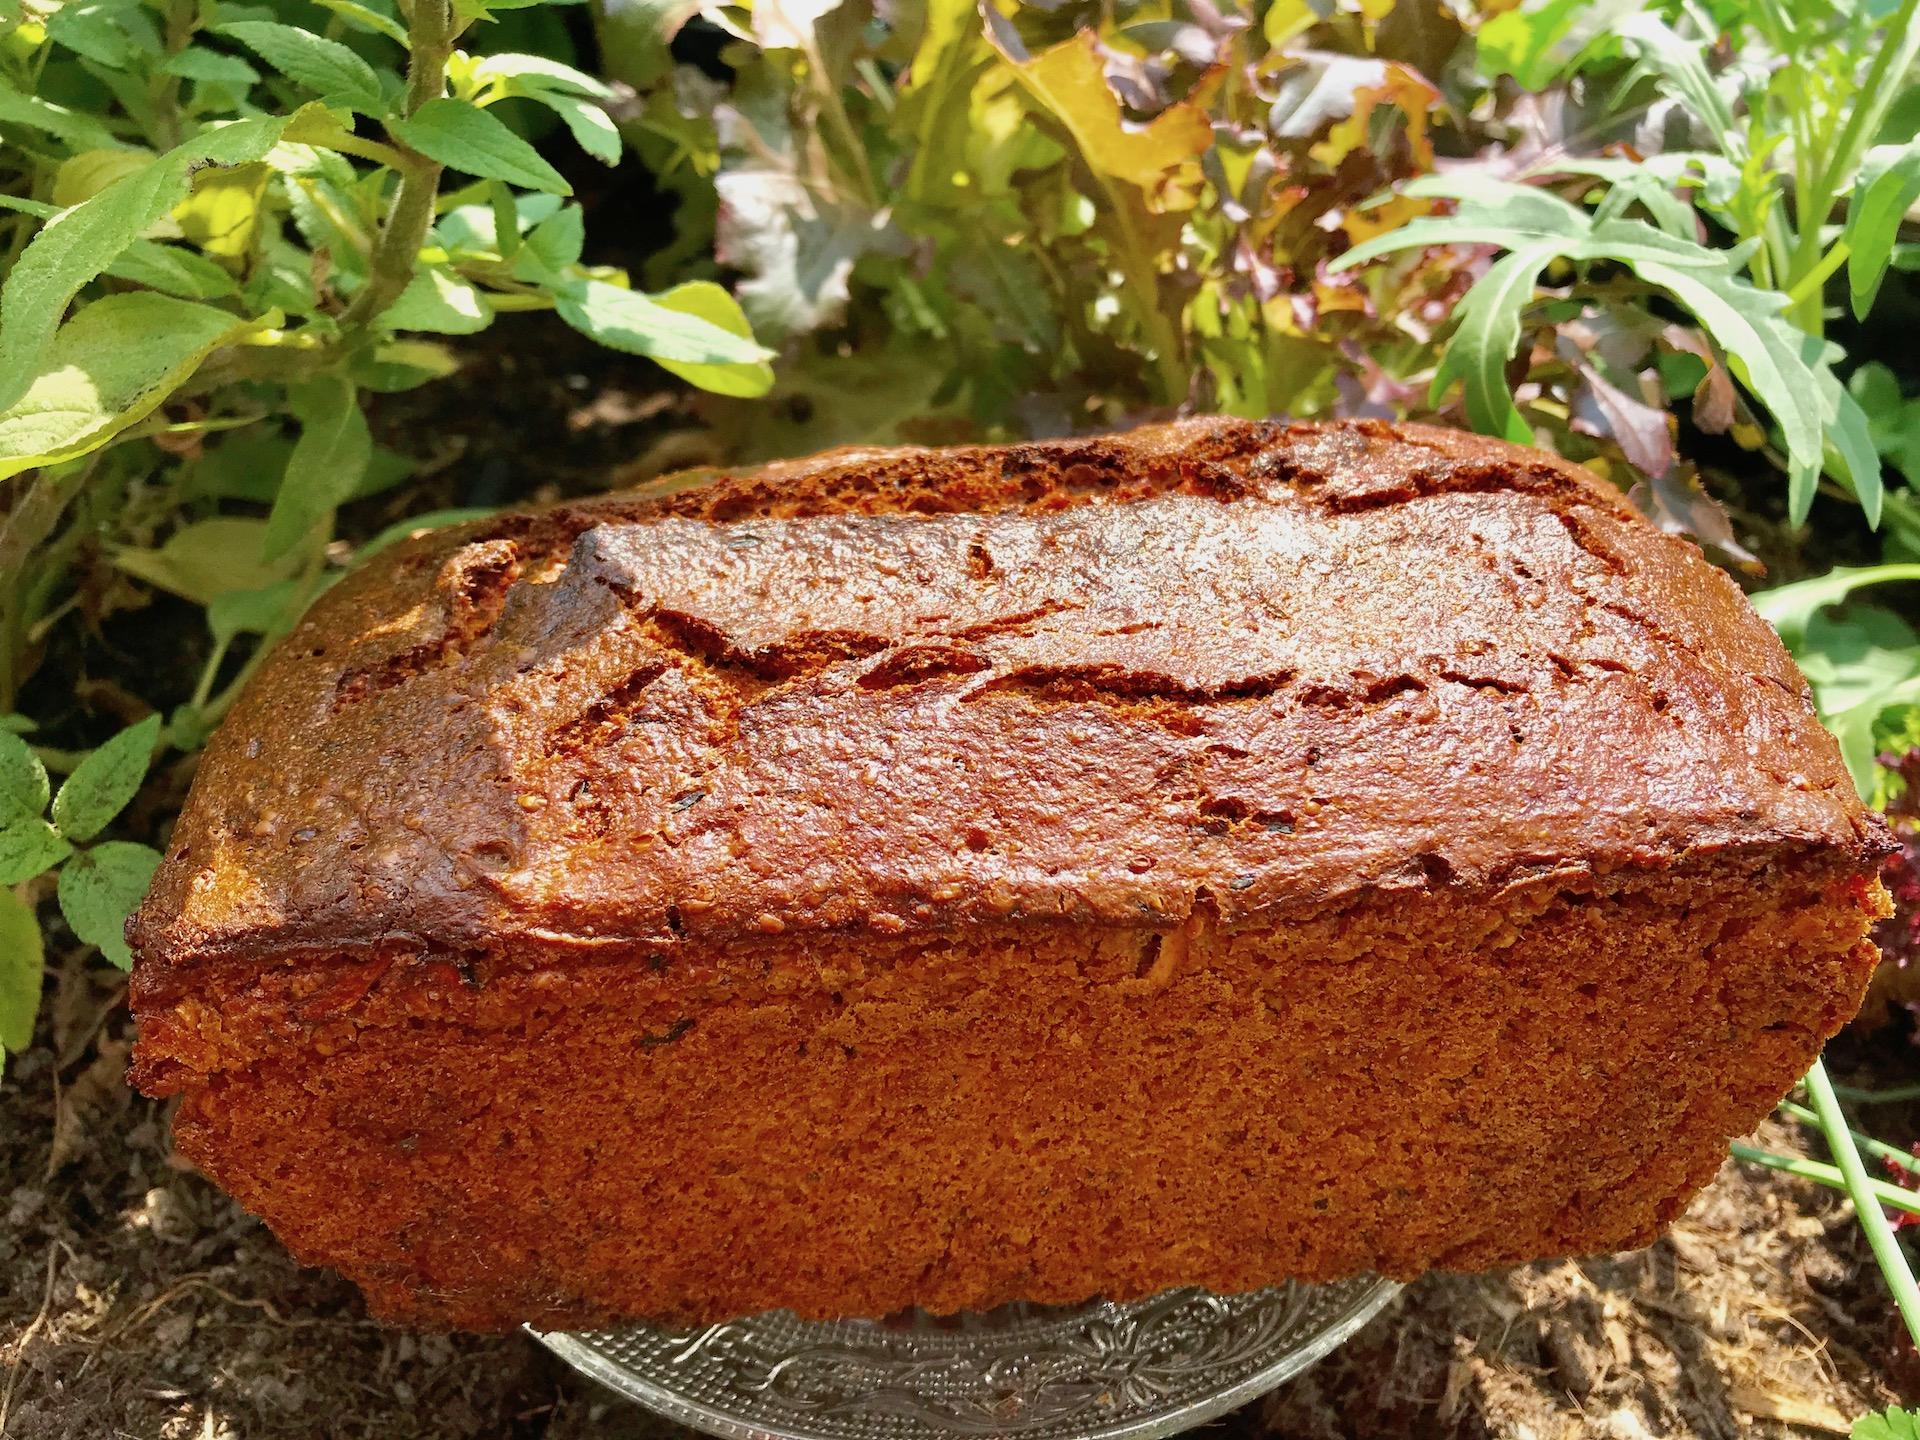 Einkorn-Zucchini-Hanf-Brot